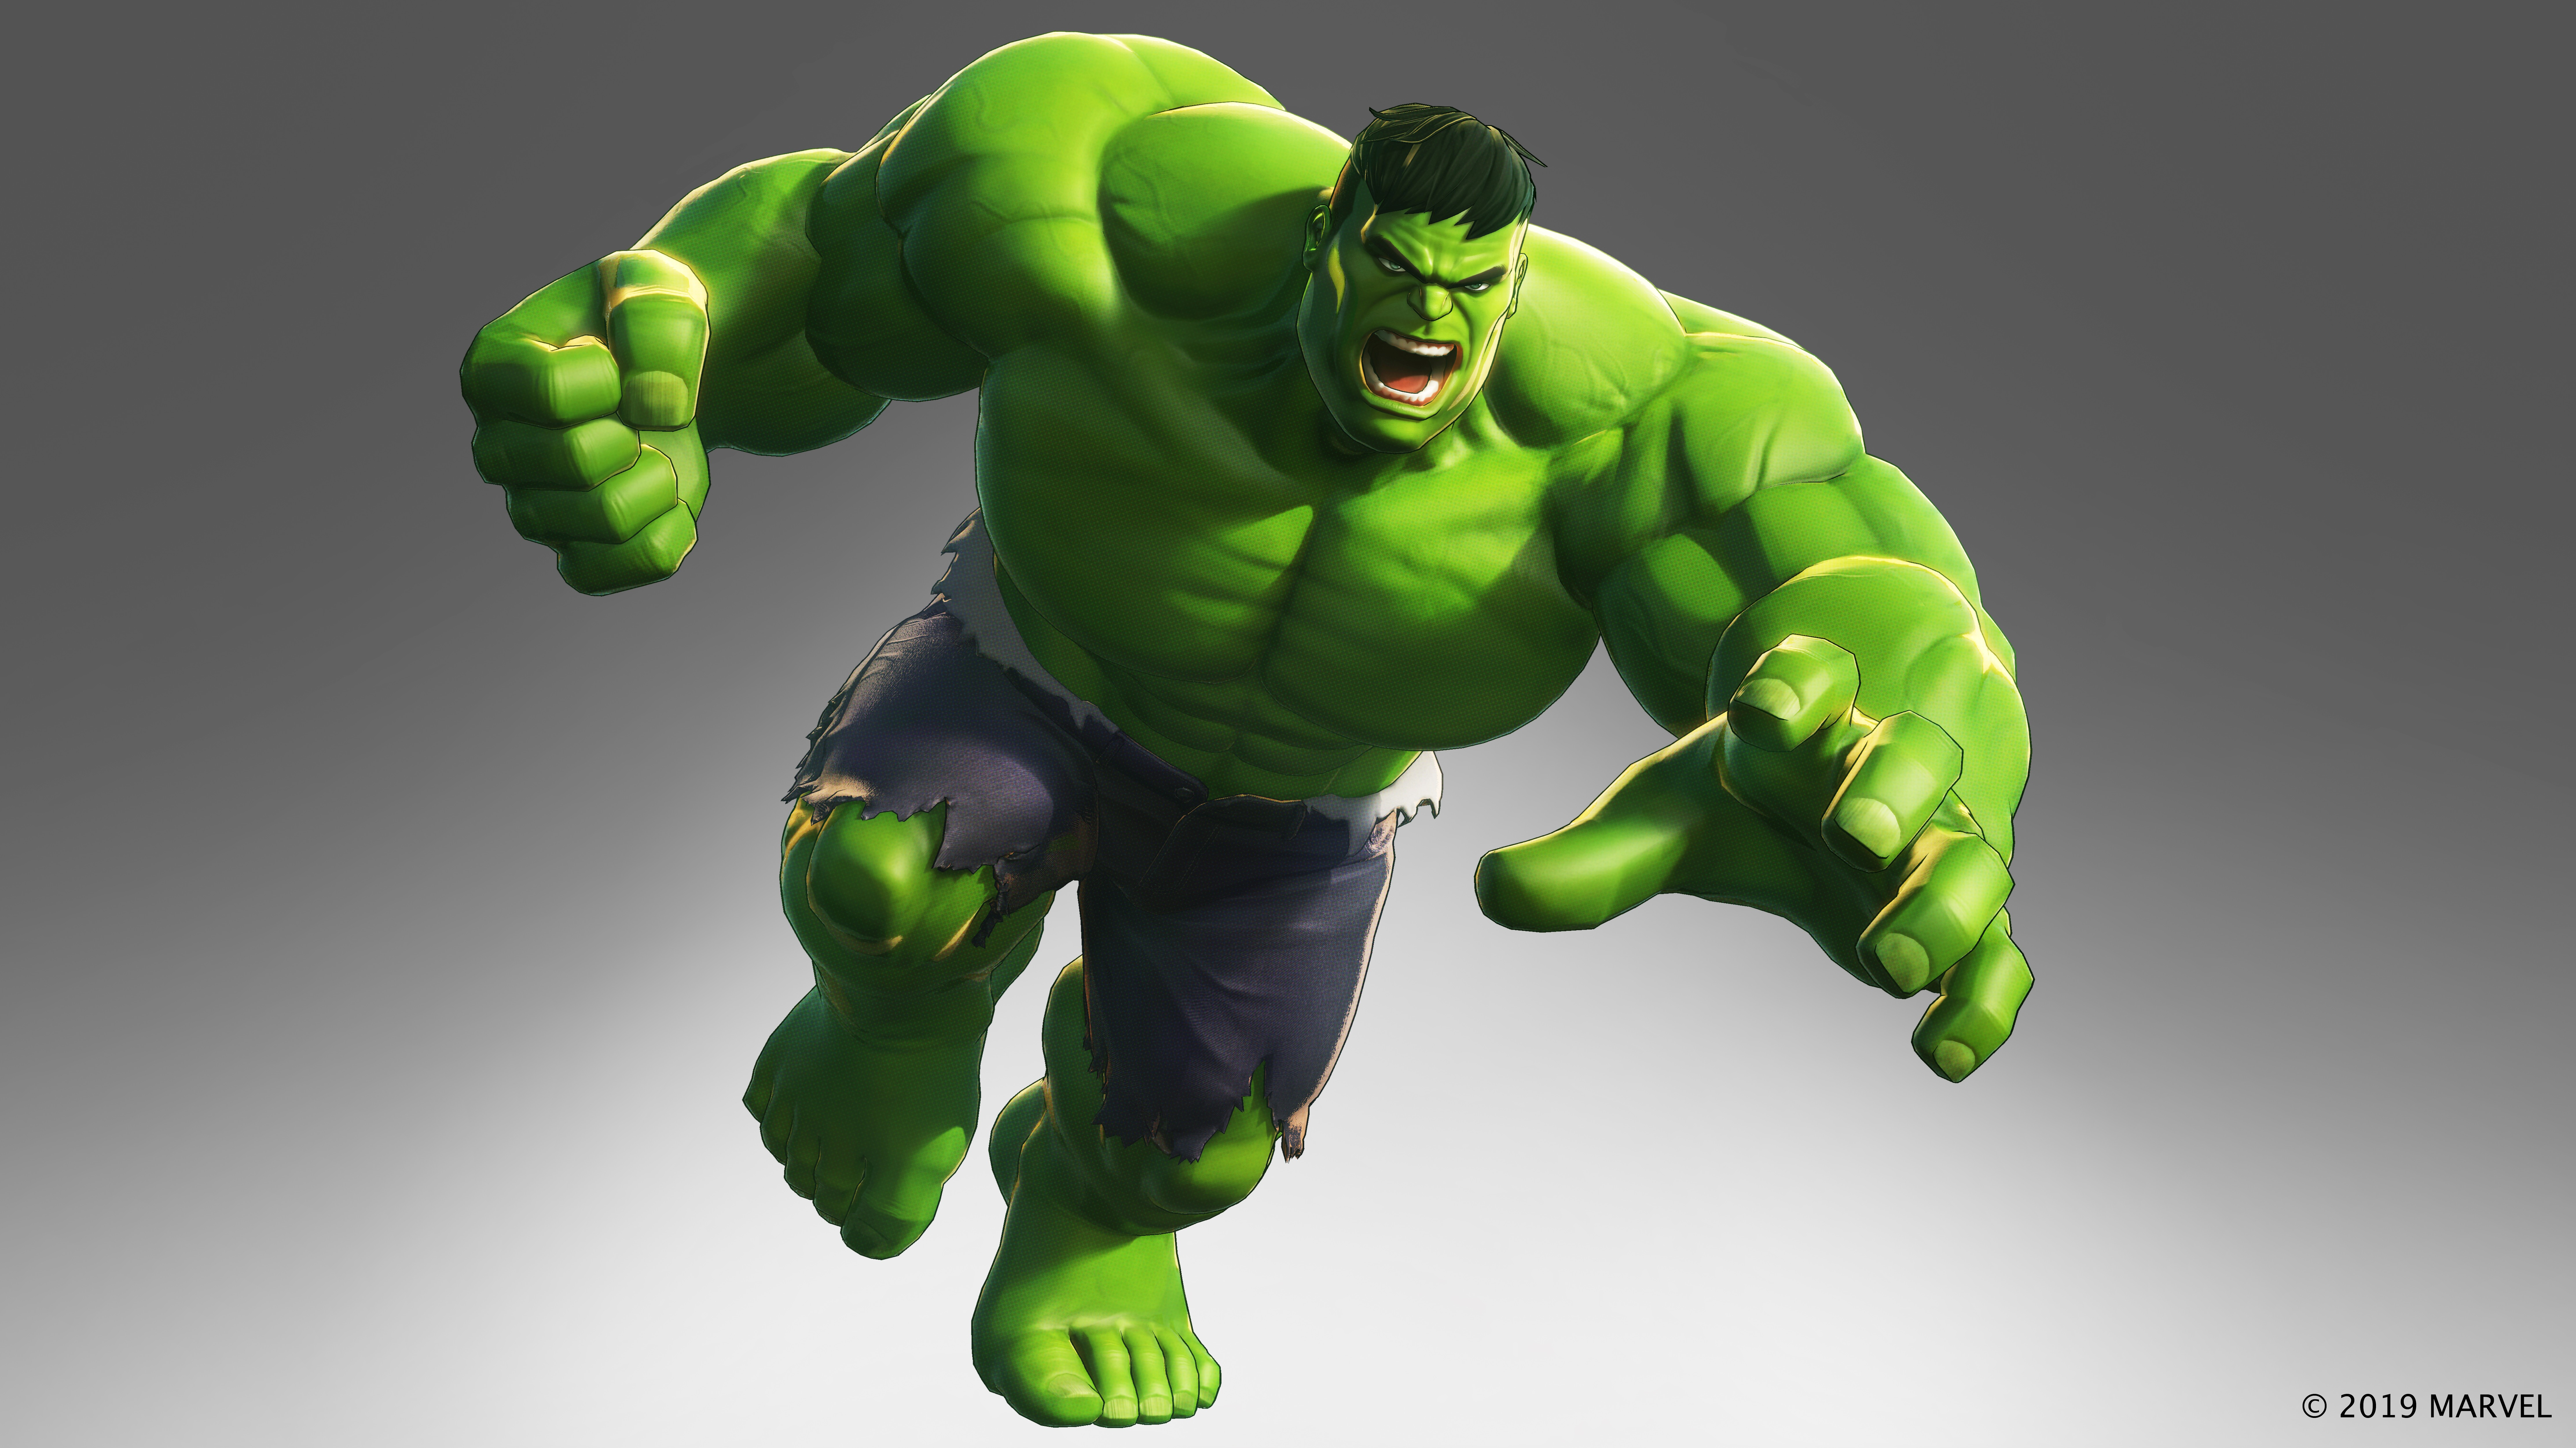 Marvel Ultimate Alliance 3 2019 Hulk, HD Games, 4k ...